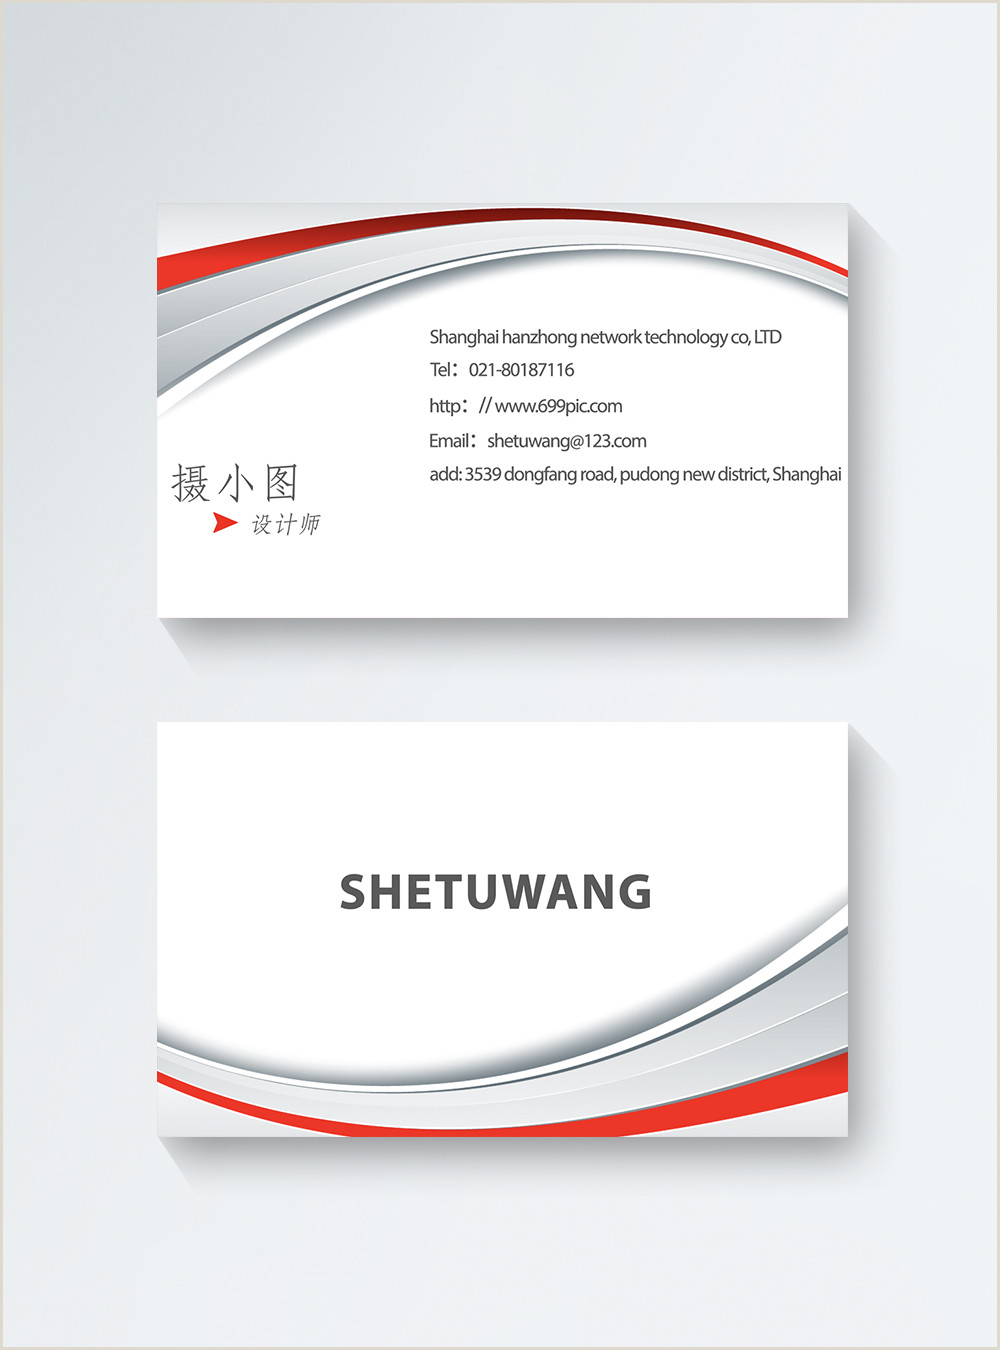 Unique Politcal Business Cards Unique Business Card Template Image Picture Free